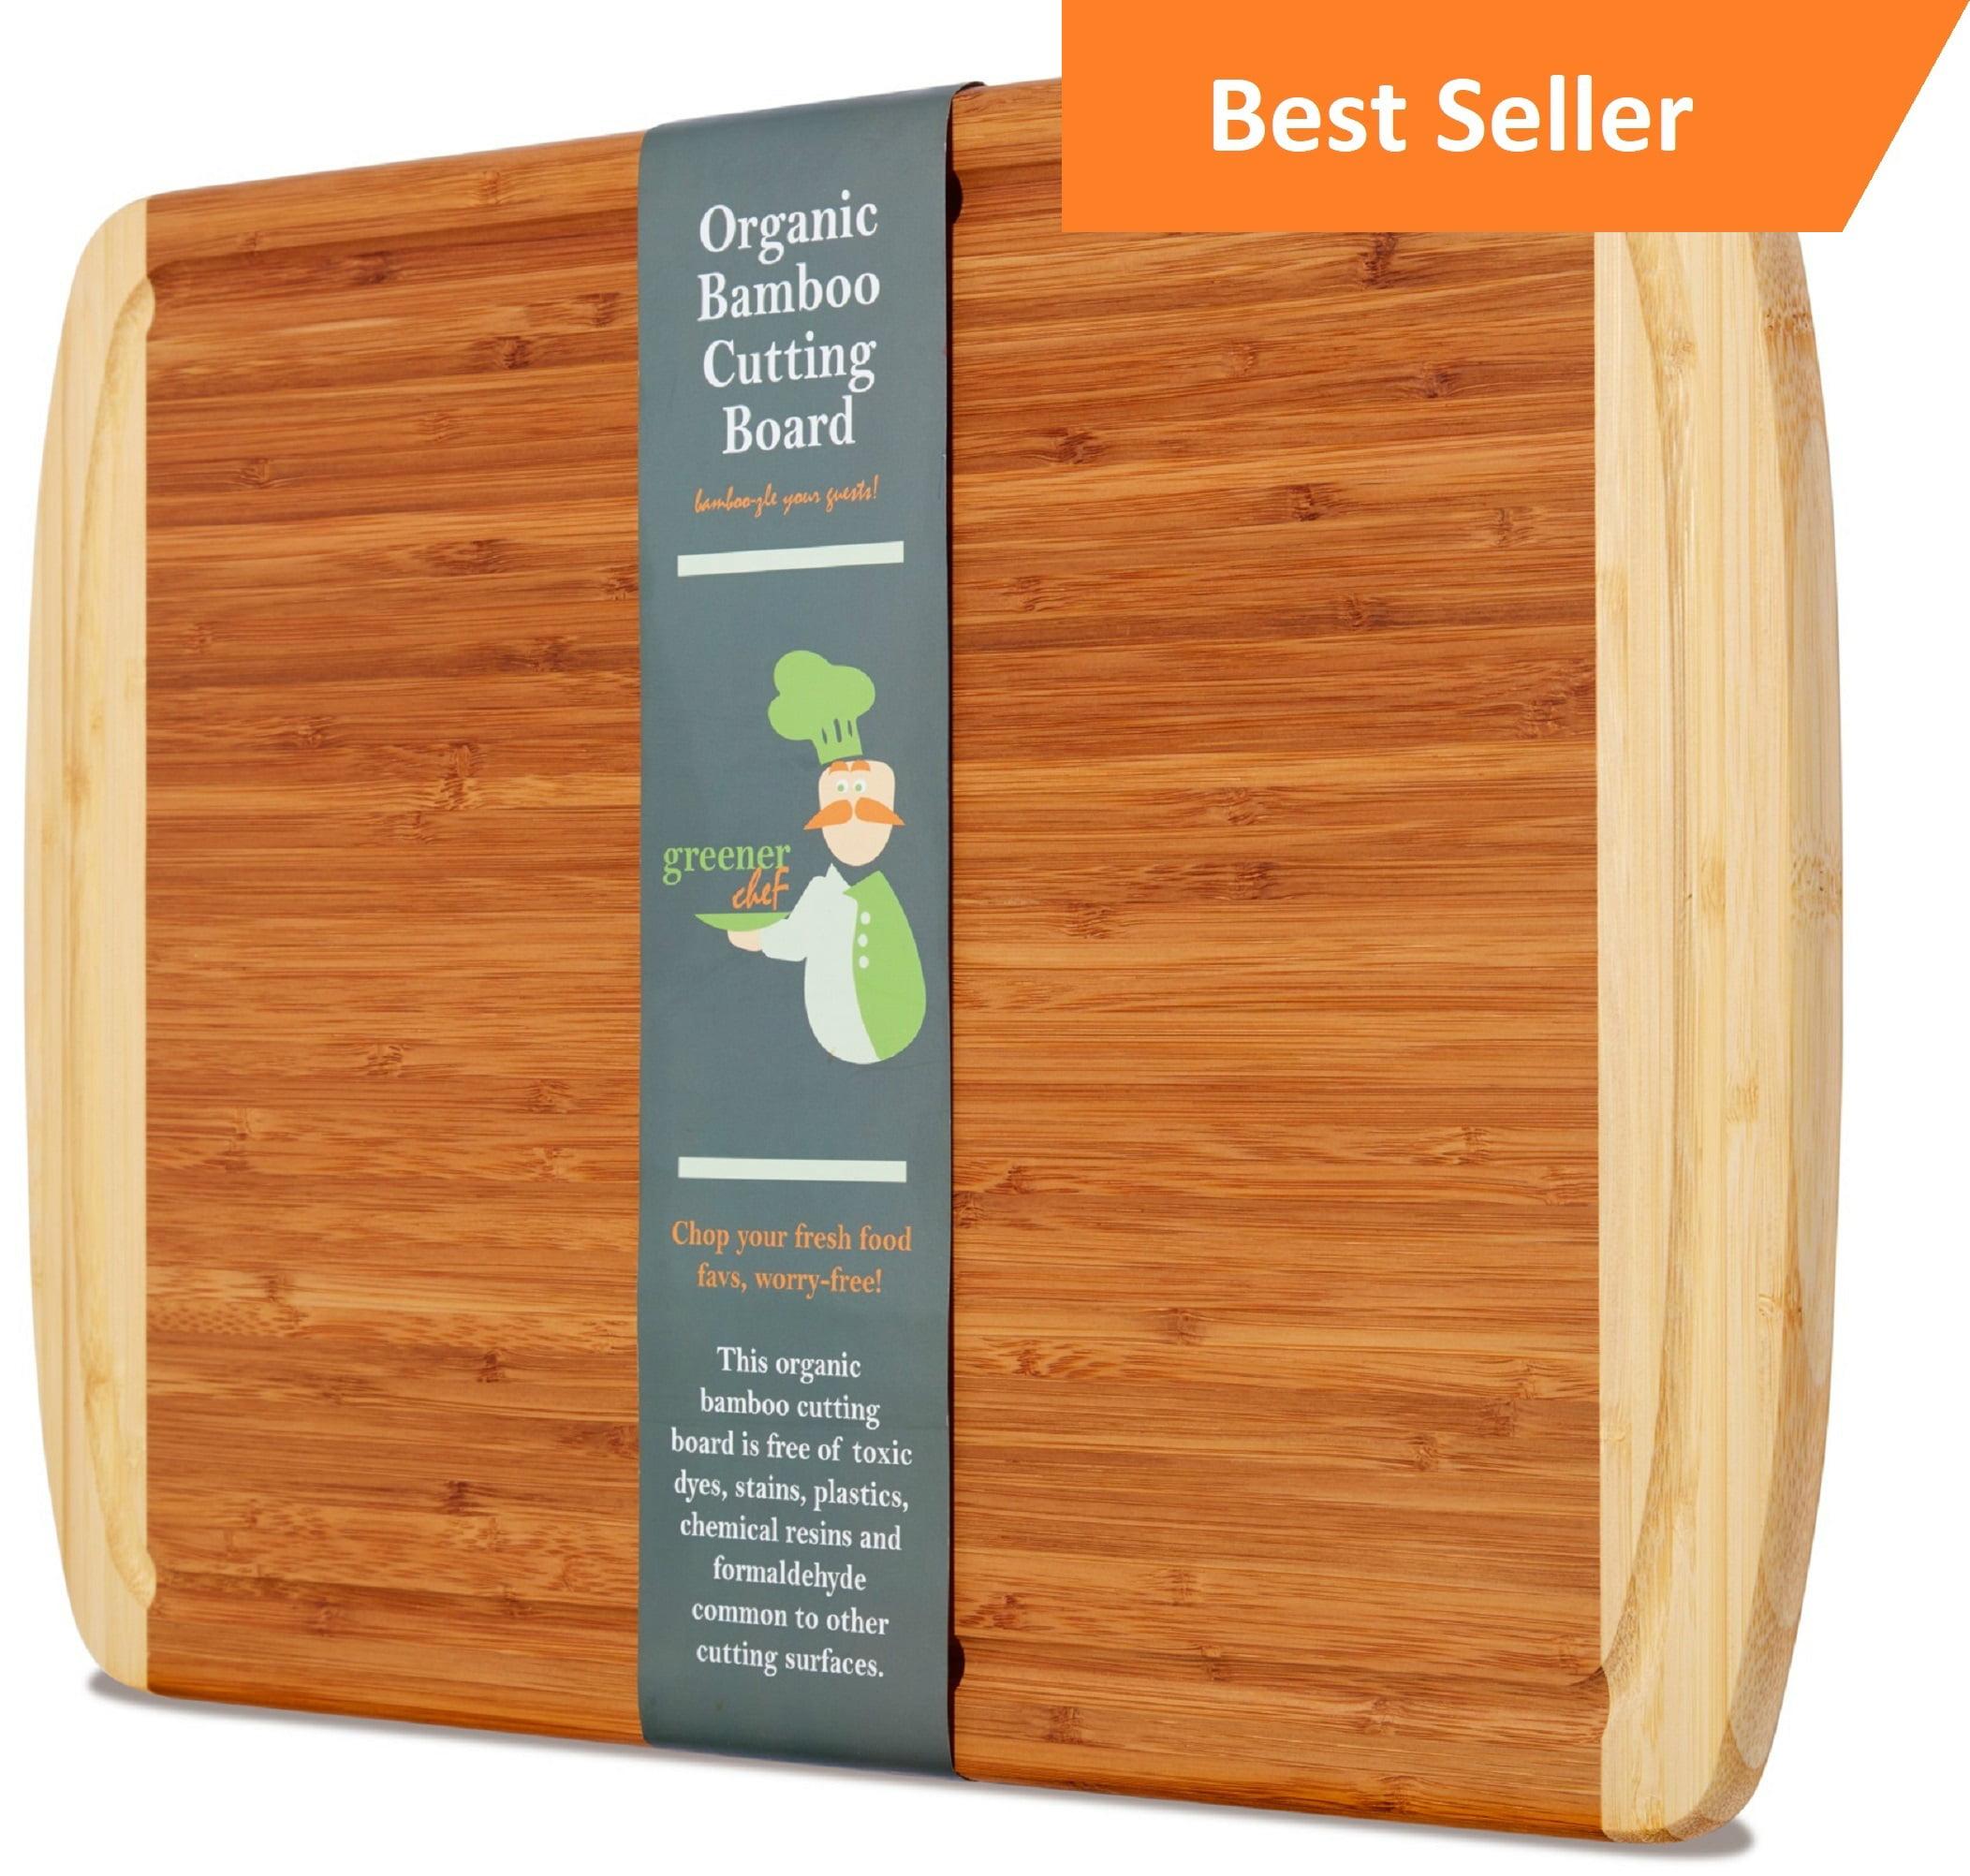 KING SIZE ORGANIC Bamboo Cutting Board w/ LIFETIME REPLACEMENT ...